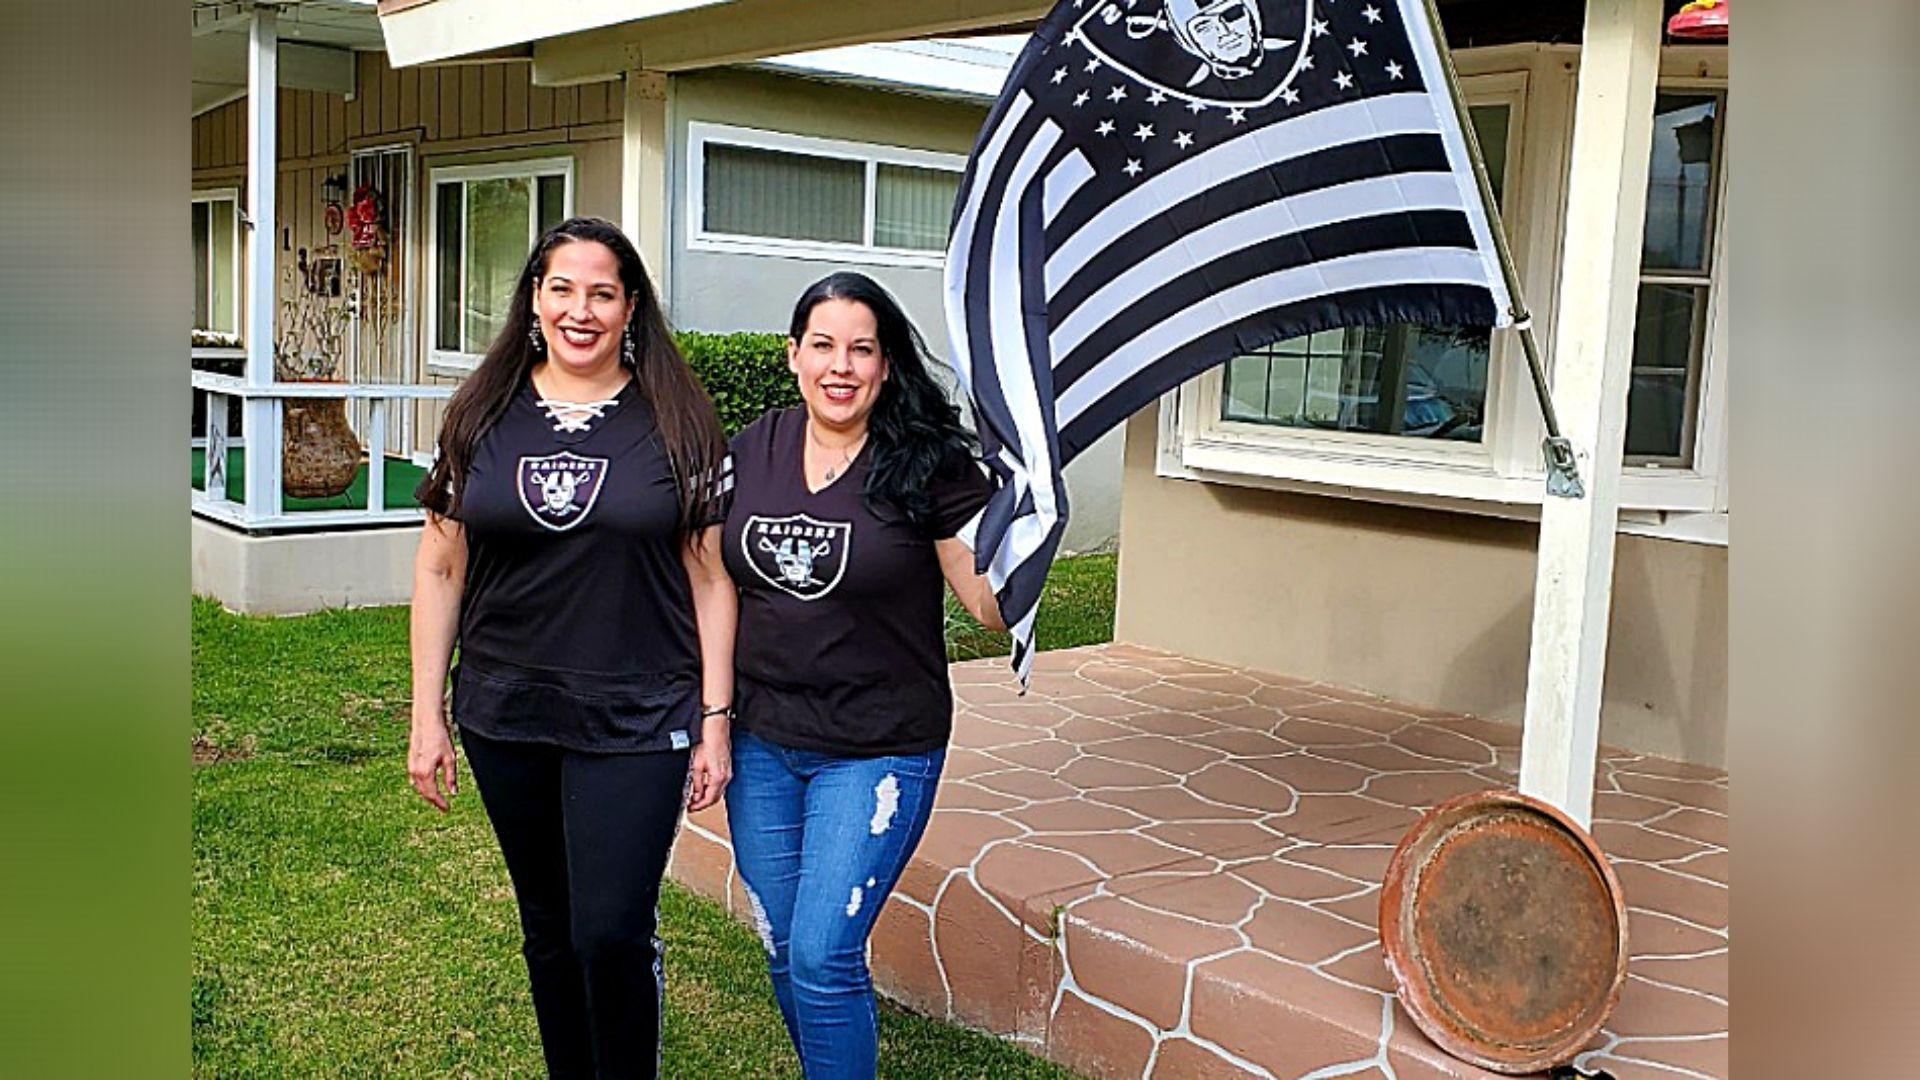 Raiders fans - Ms. Armiento.jpg